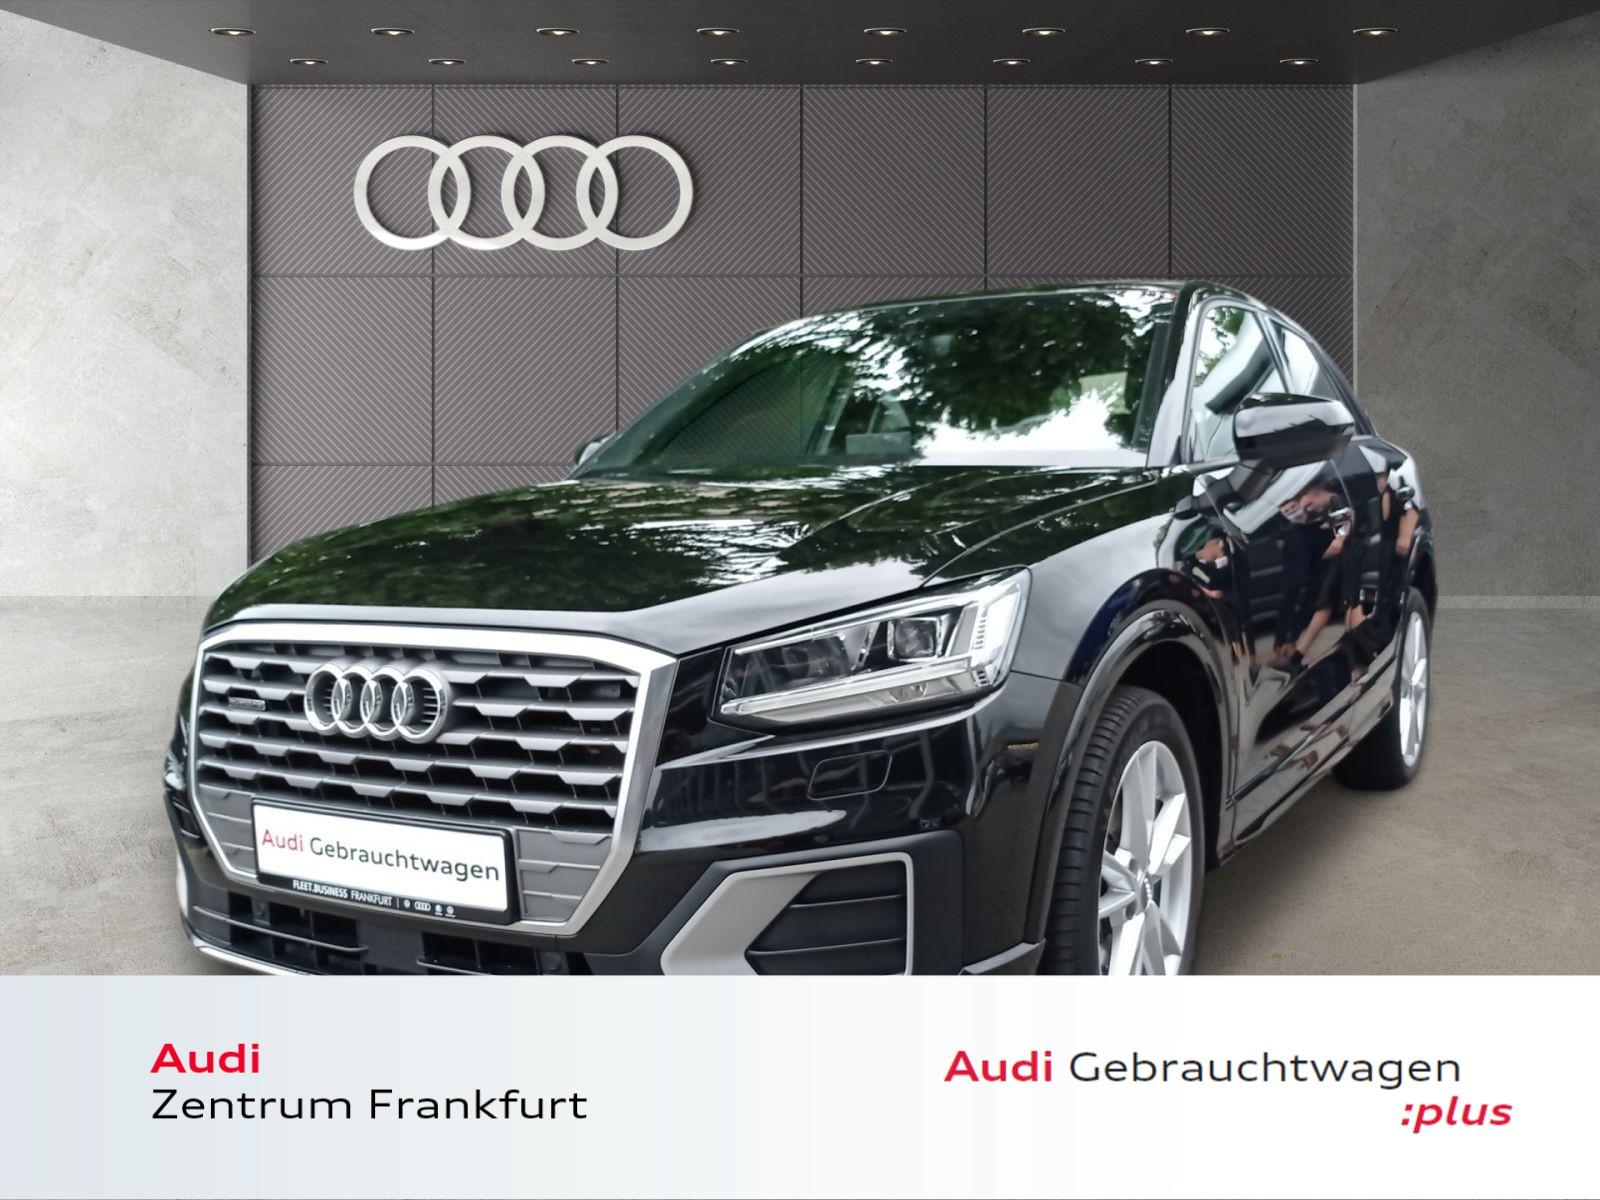 Audi Q2 2.0 TDI quattro S tronic S line LED Navi PDC Sitzheizung, Jahr 2018, Diesel